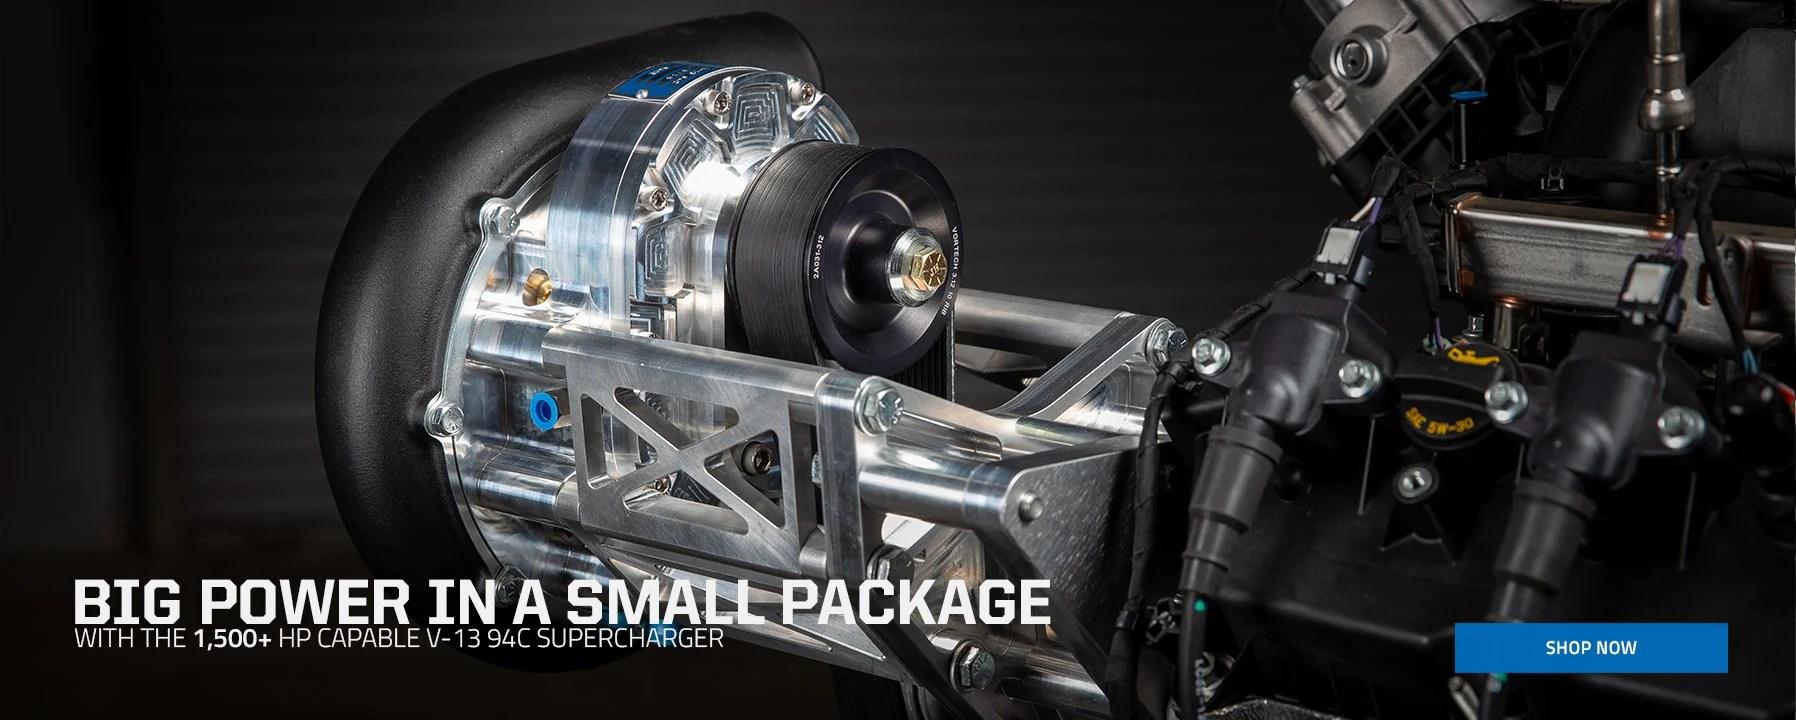 honda vortech superchargers on 1986 honda rebel carburetor honda rebel 250 wiring diagram  [ 1796 x 720 Pixel ]